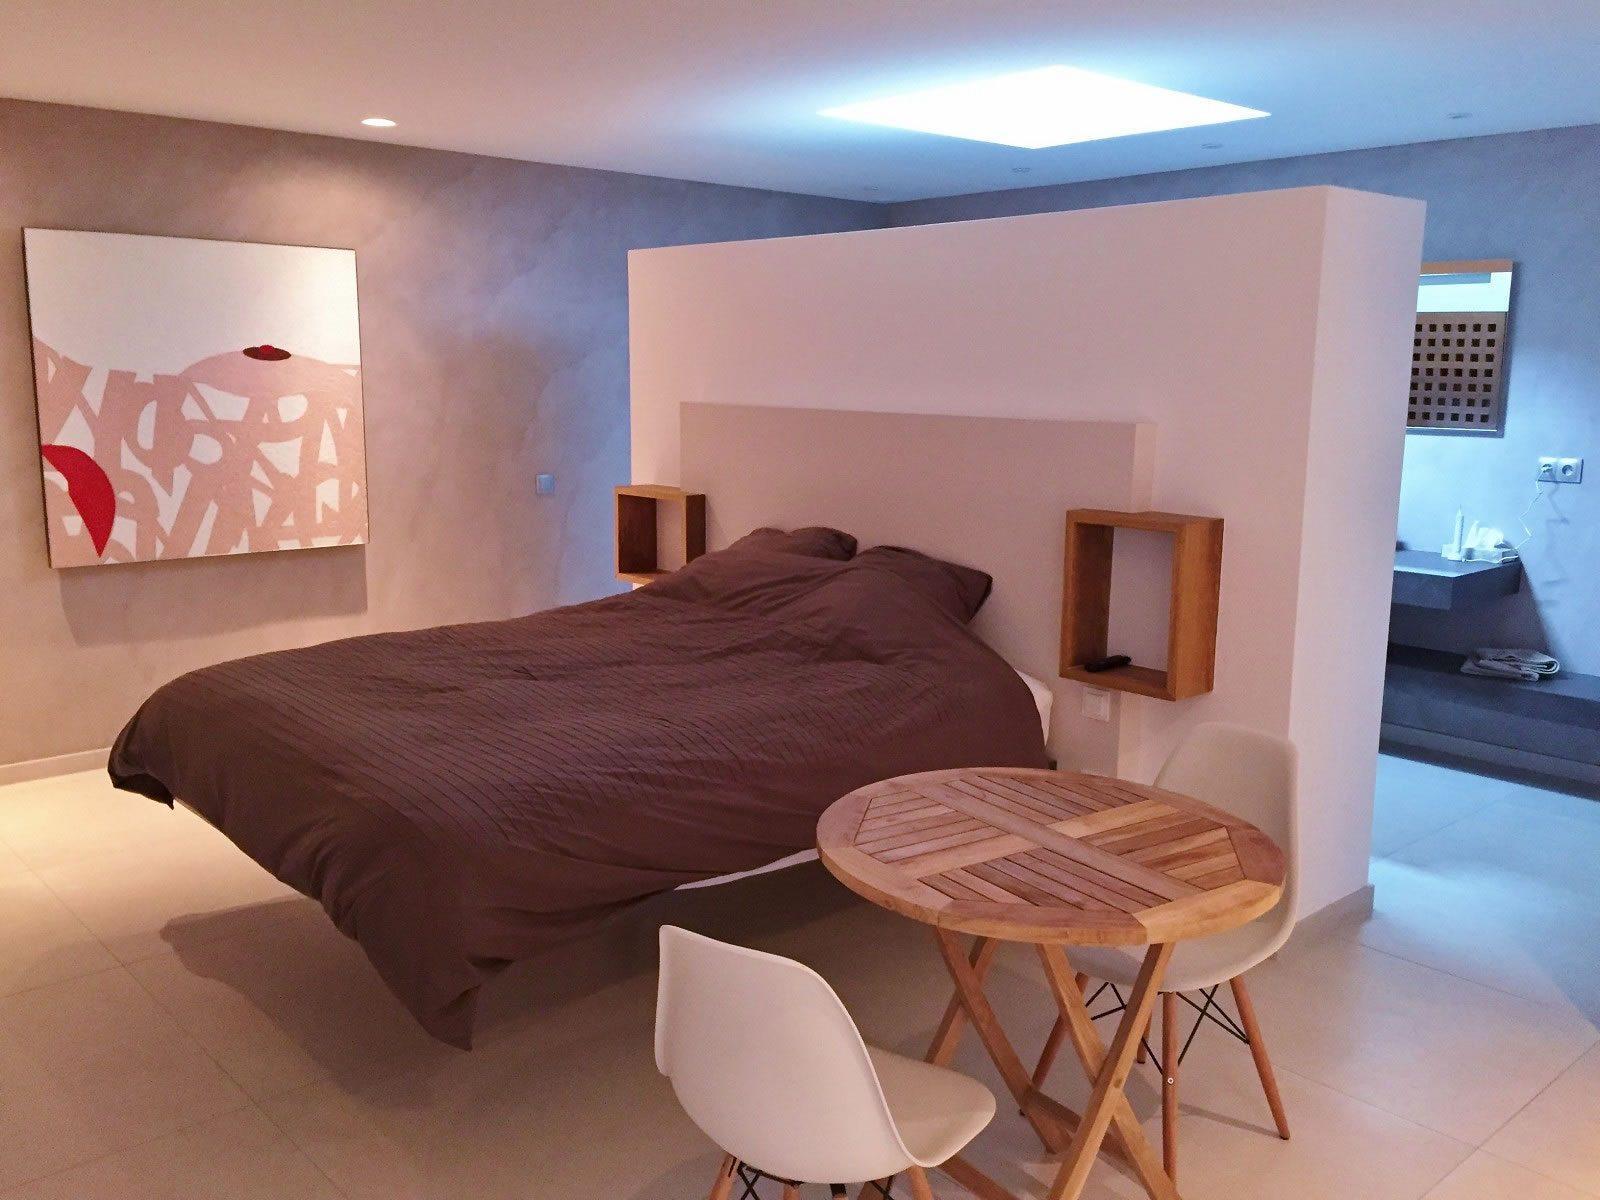 magnifique-propriete-a-vendre-garde-freinet-renovee-contemporaine-piscine-cheminee-terrasse-jacuzzi